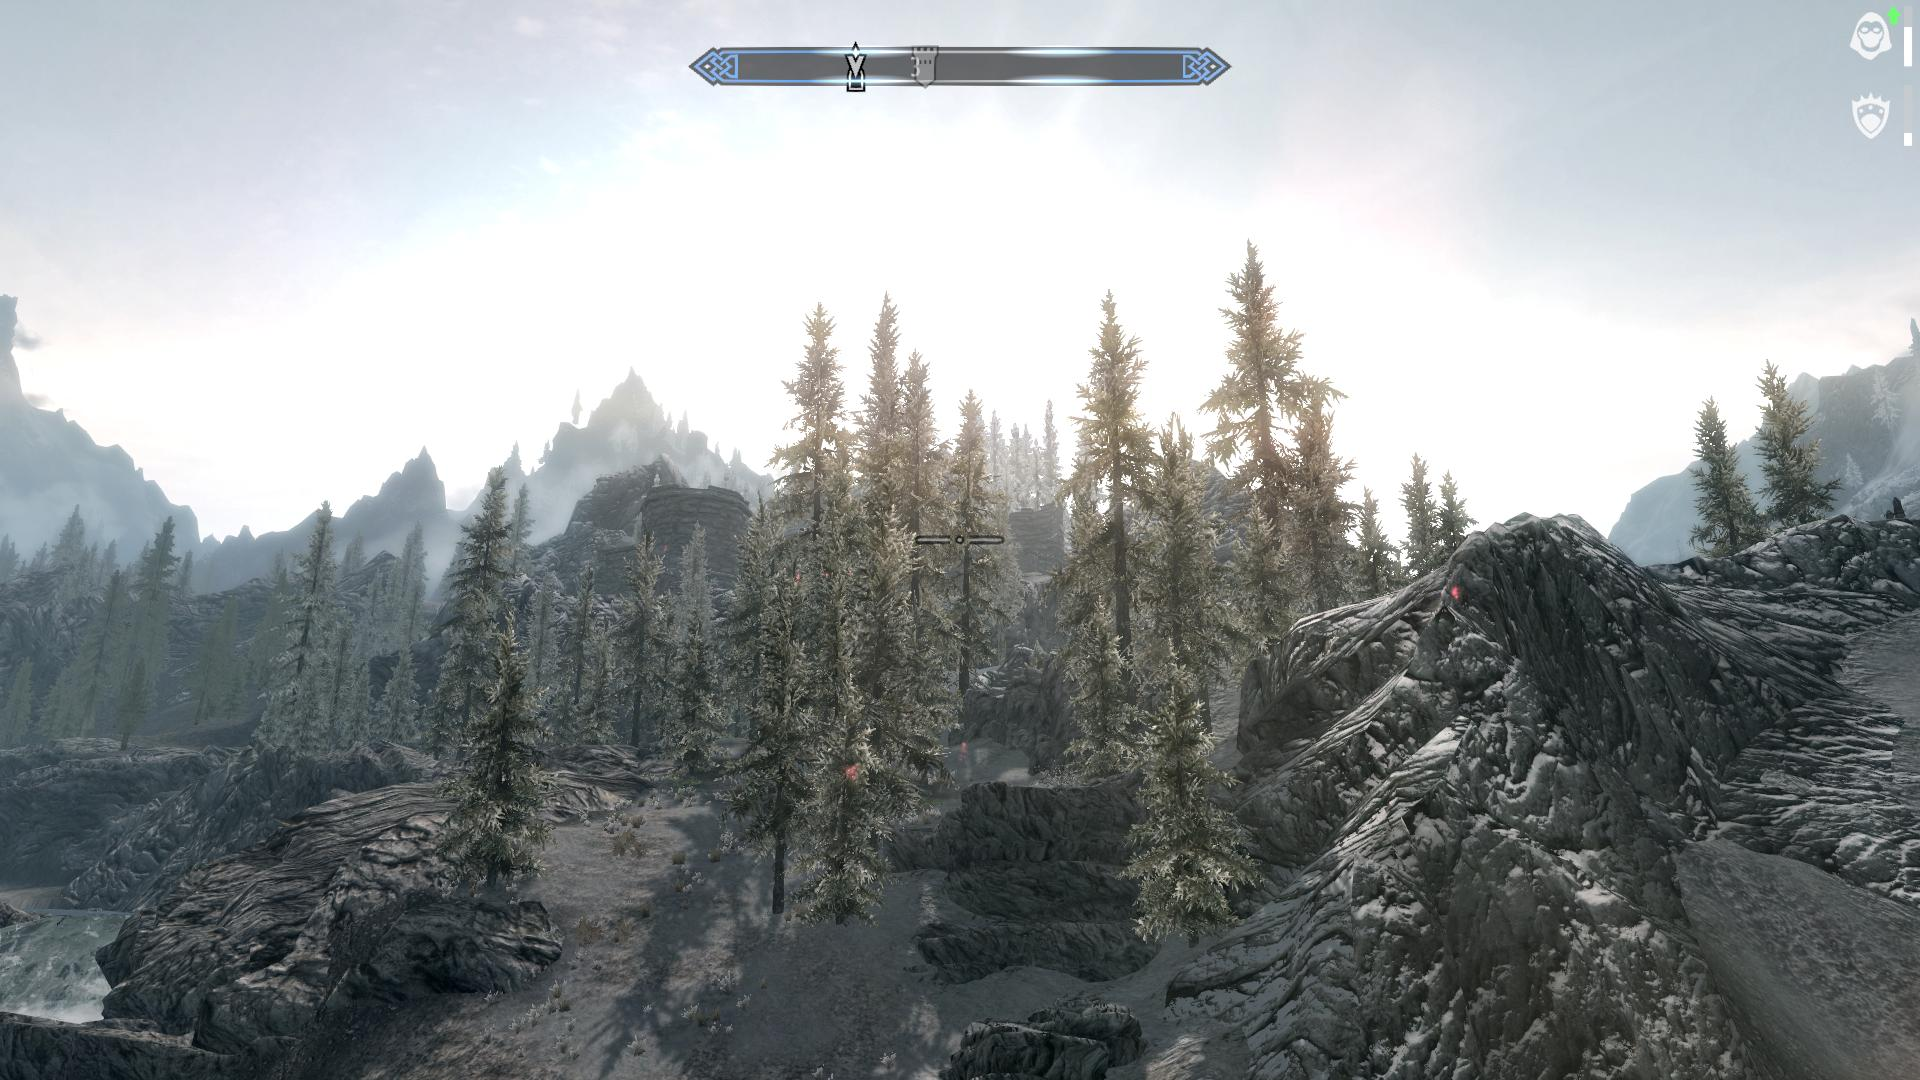 000209.Jpg - Elder Scrolls 5: Skyrim, the